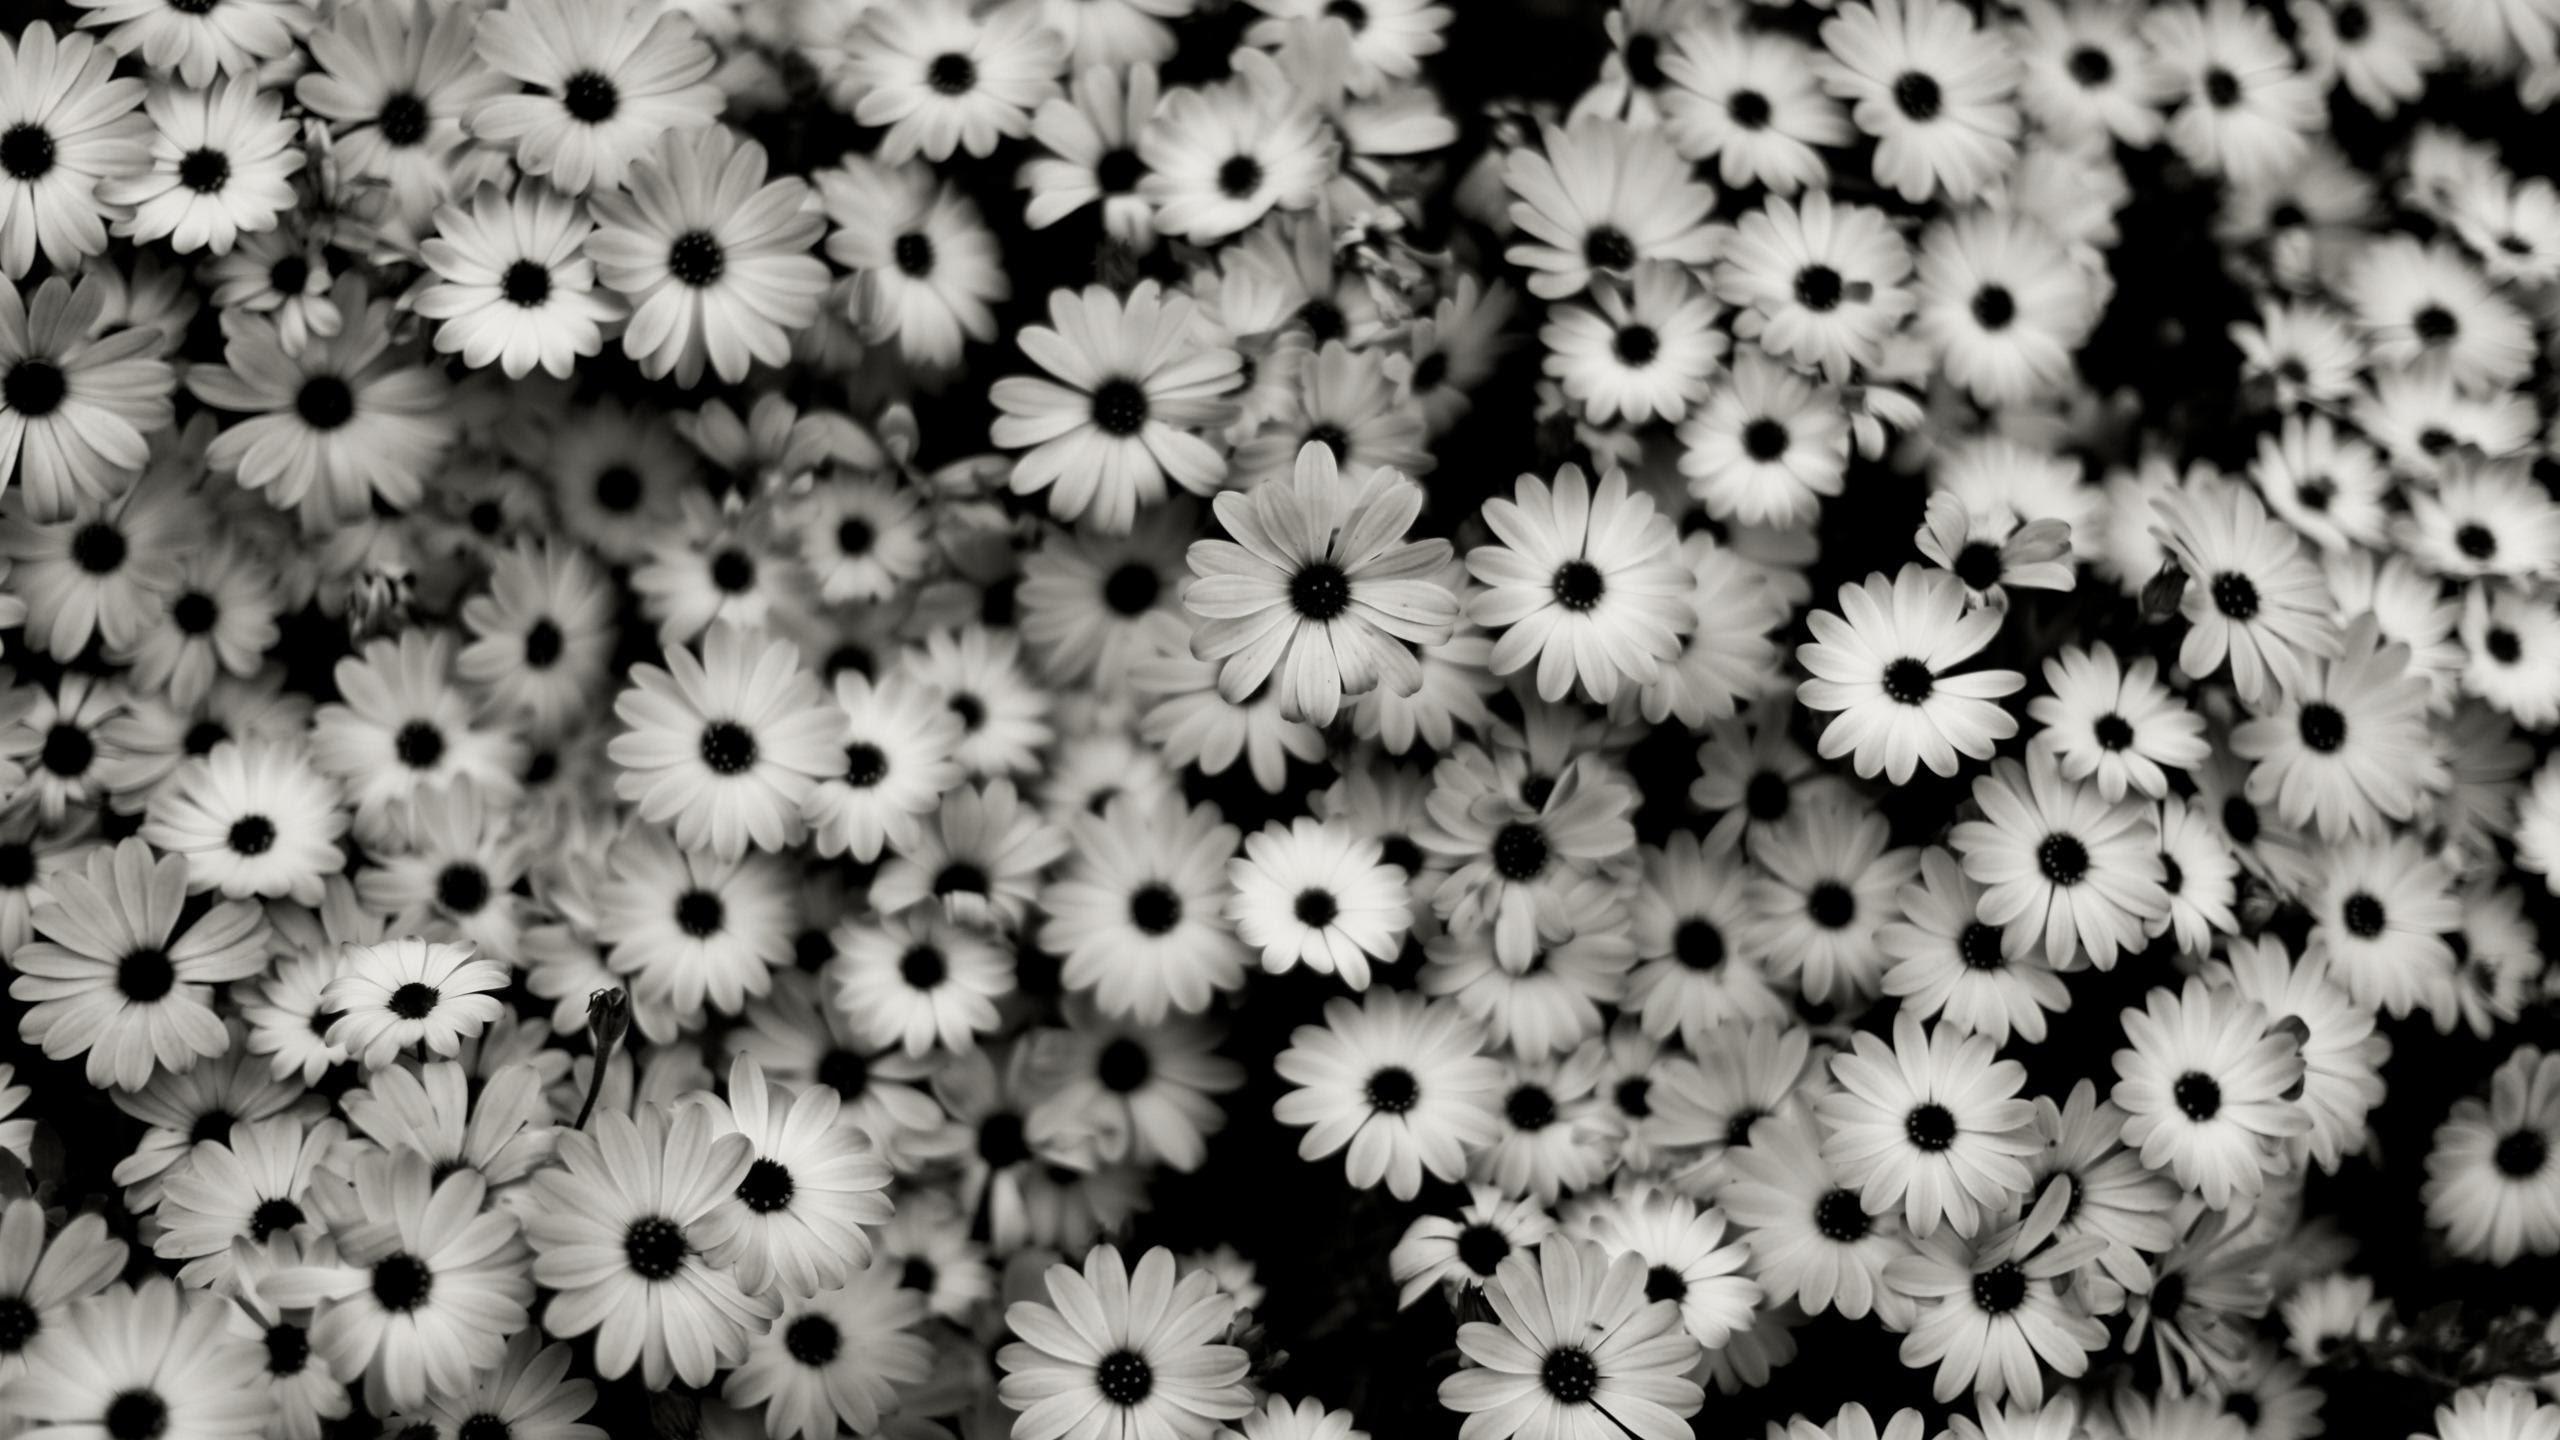 Explore Black Wallpaper, Photo Wallpaper and more!